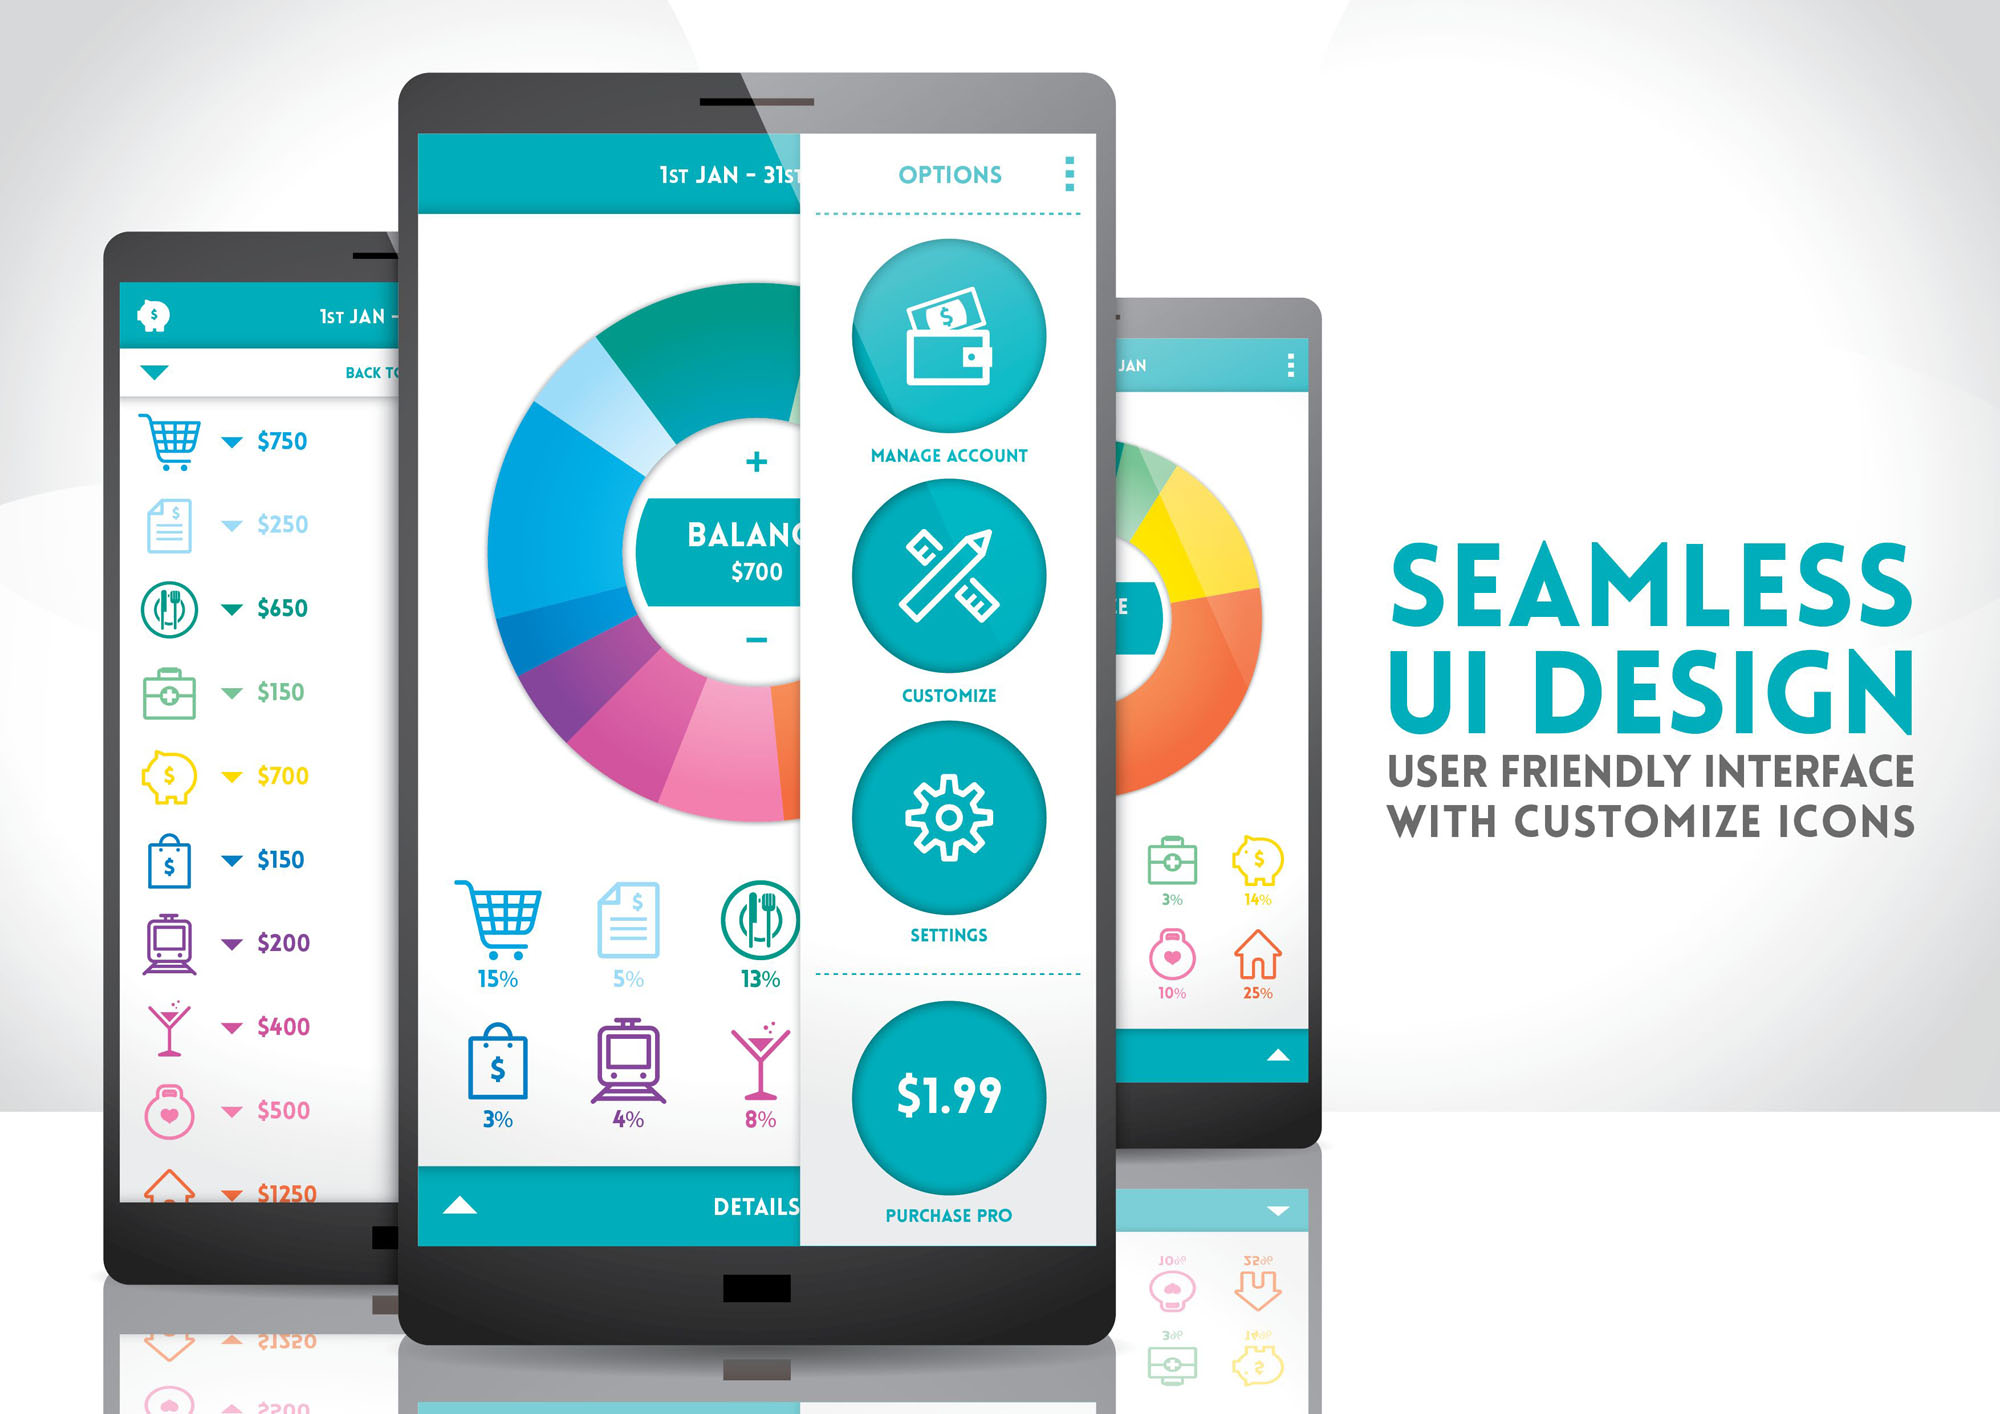 Design lebih mengutamakan User Experience